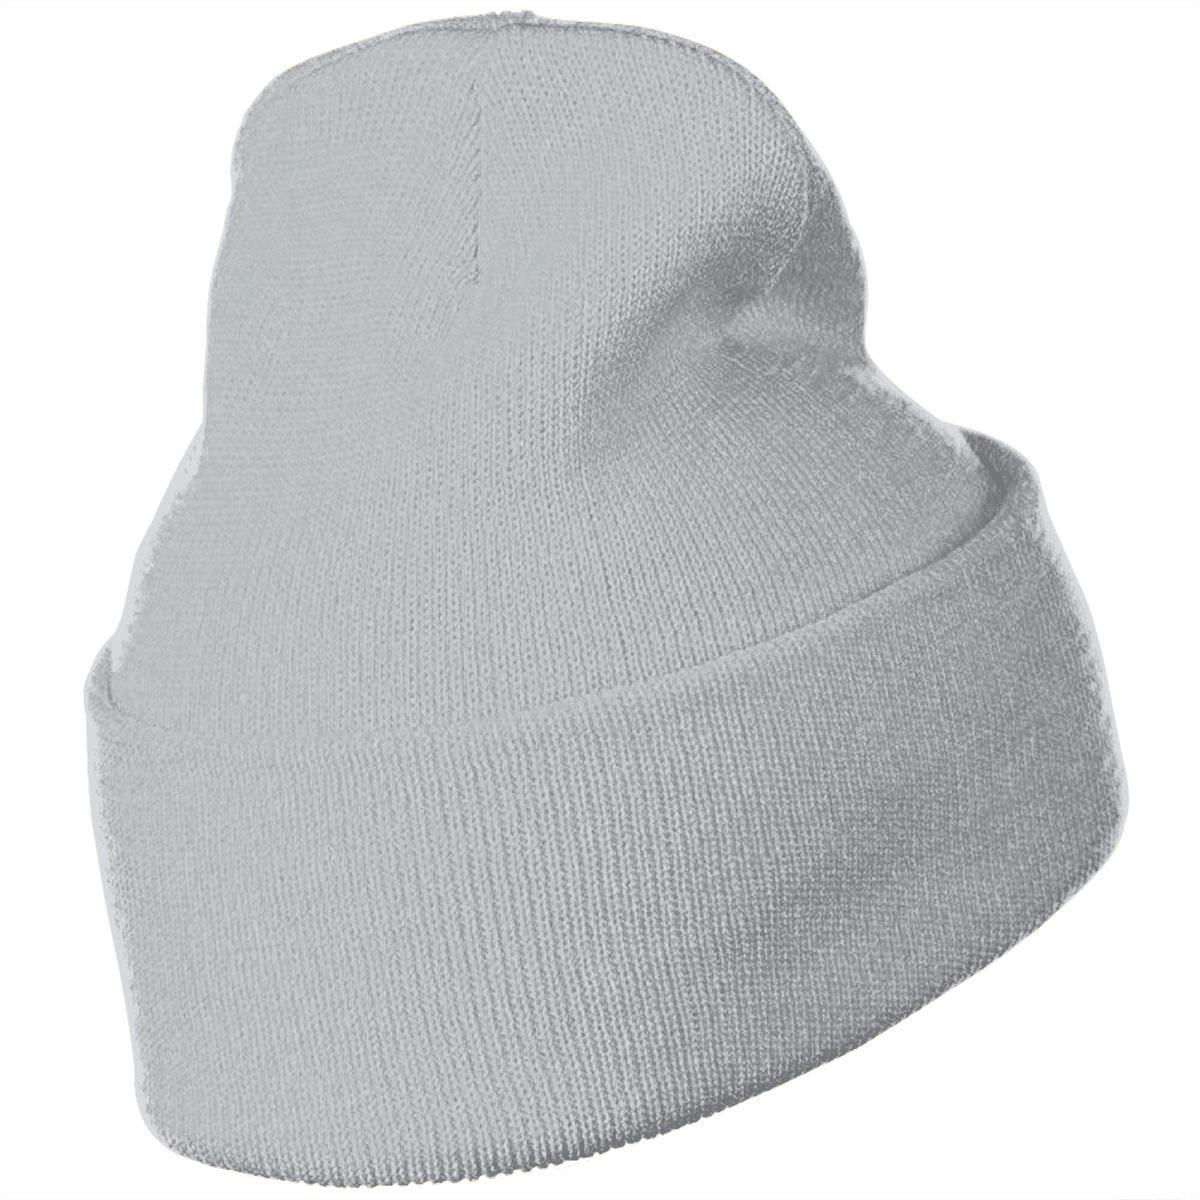 Owl Warm Knit Winter Solid Beanie Hat Unisex Skull Cap